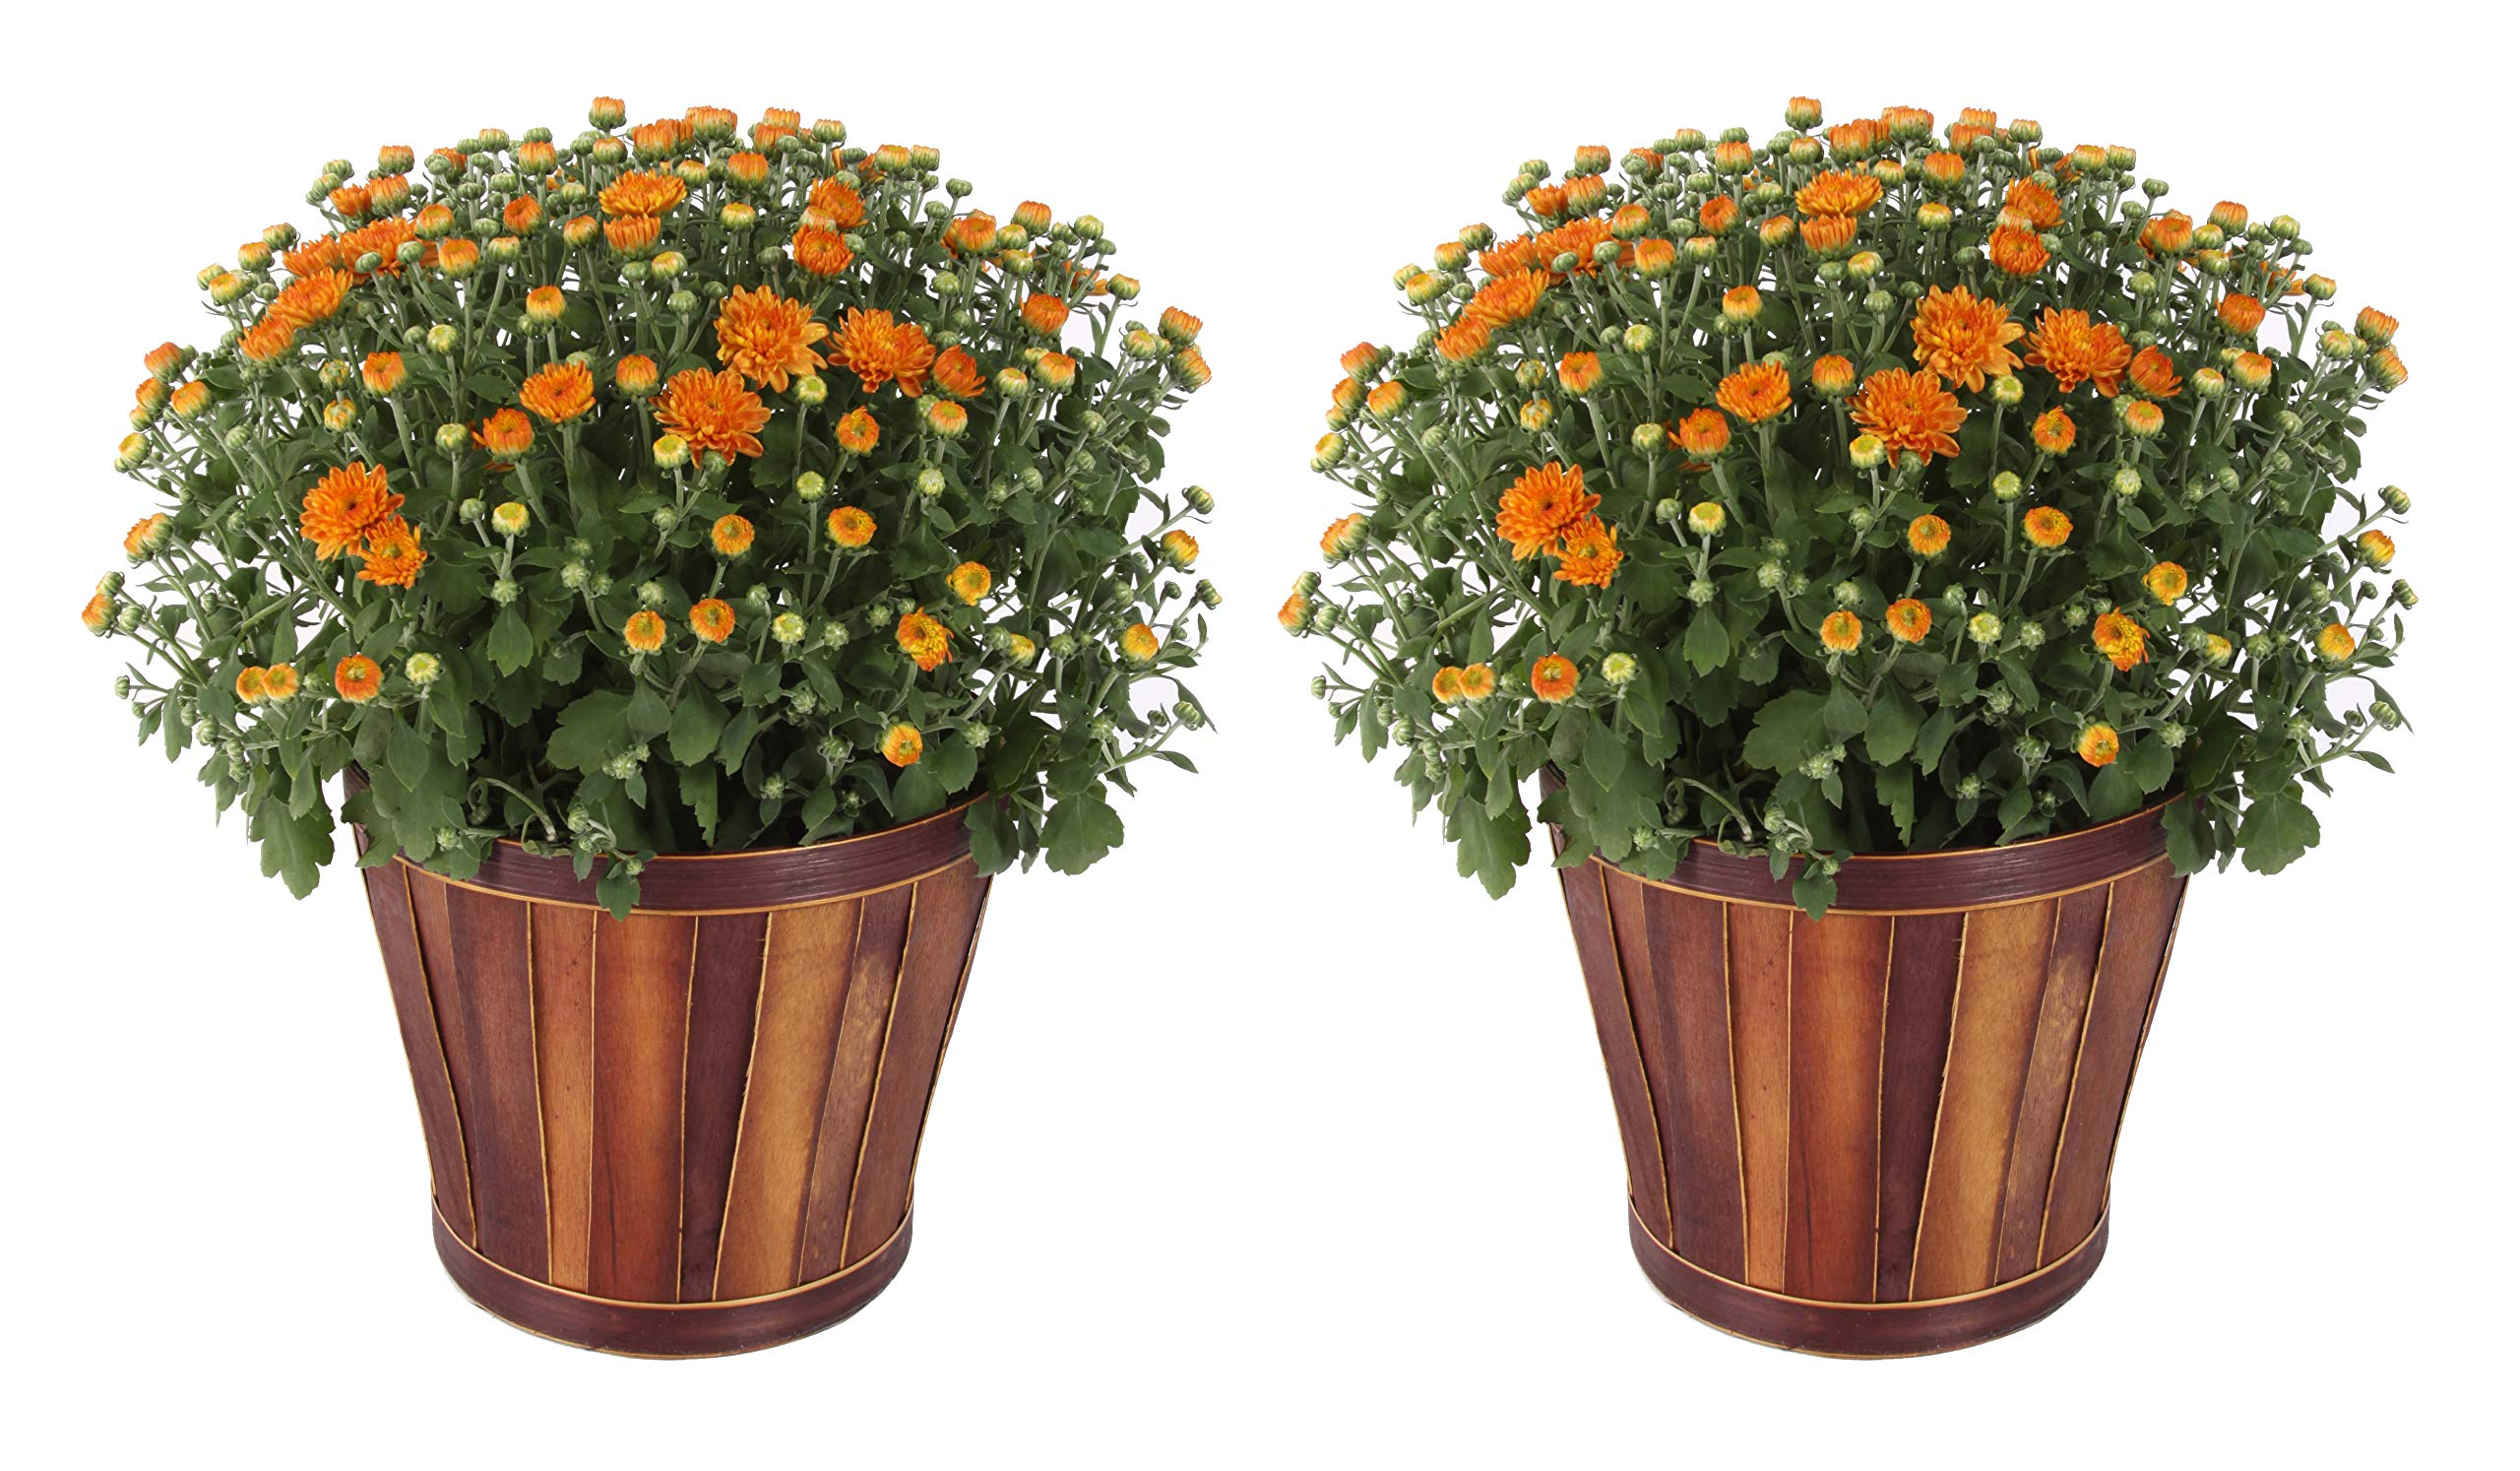 Costa Farms Chrysanthemum, Mums Ships in Bud Form, Bloom Porch and Patio Ready Bushel Basket, 3-QT, Orange by Costa Farms